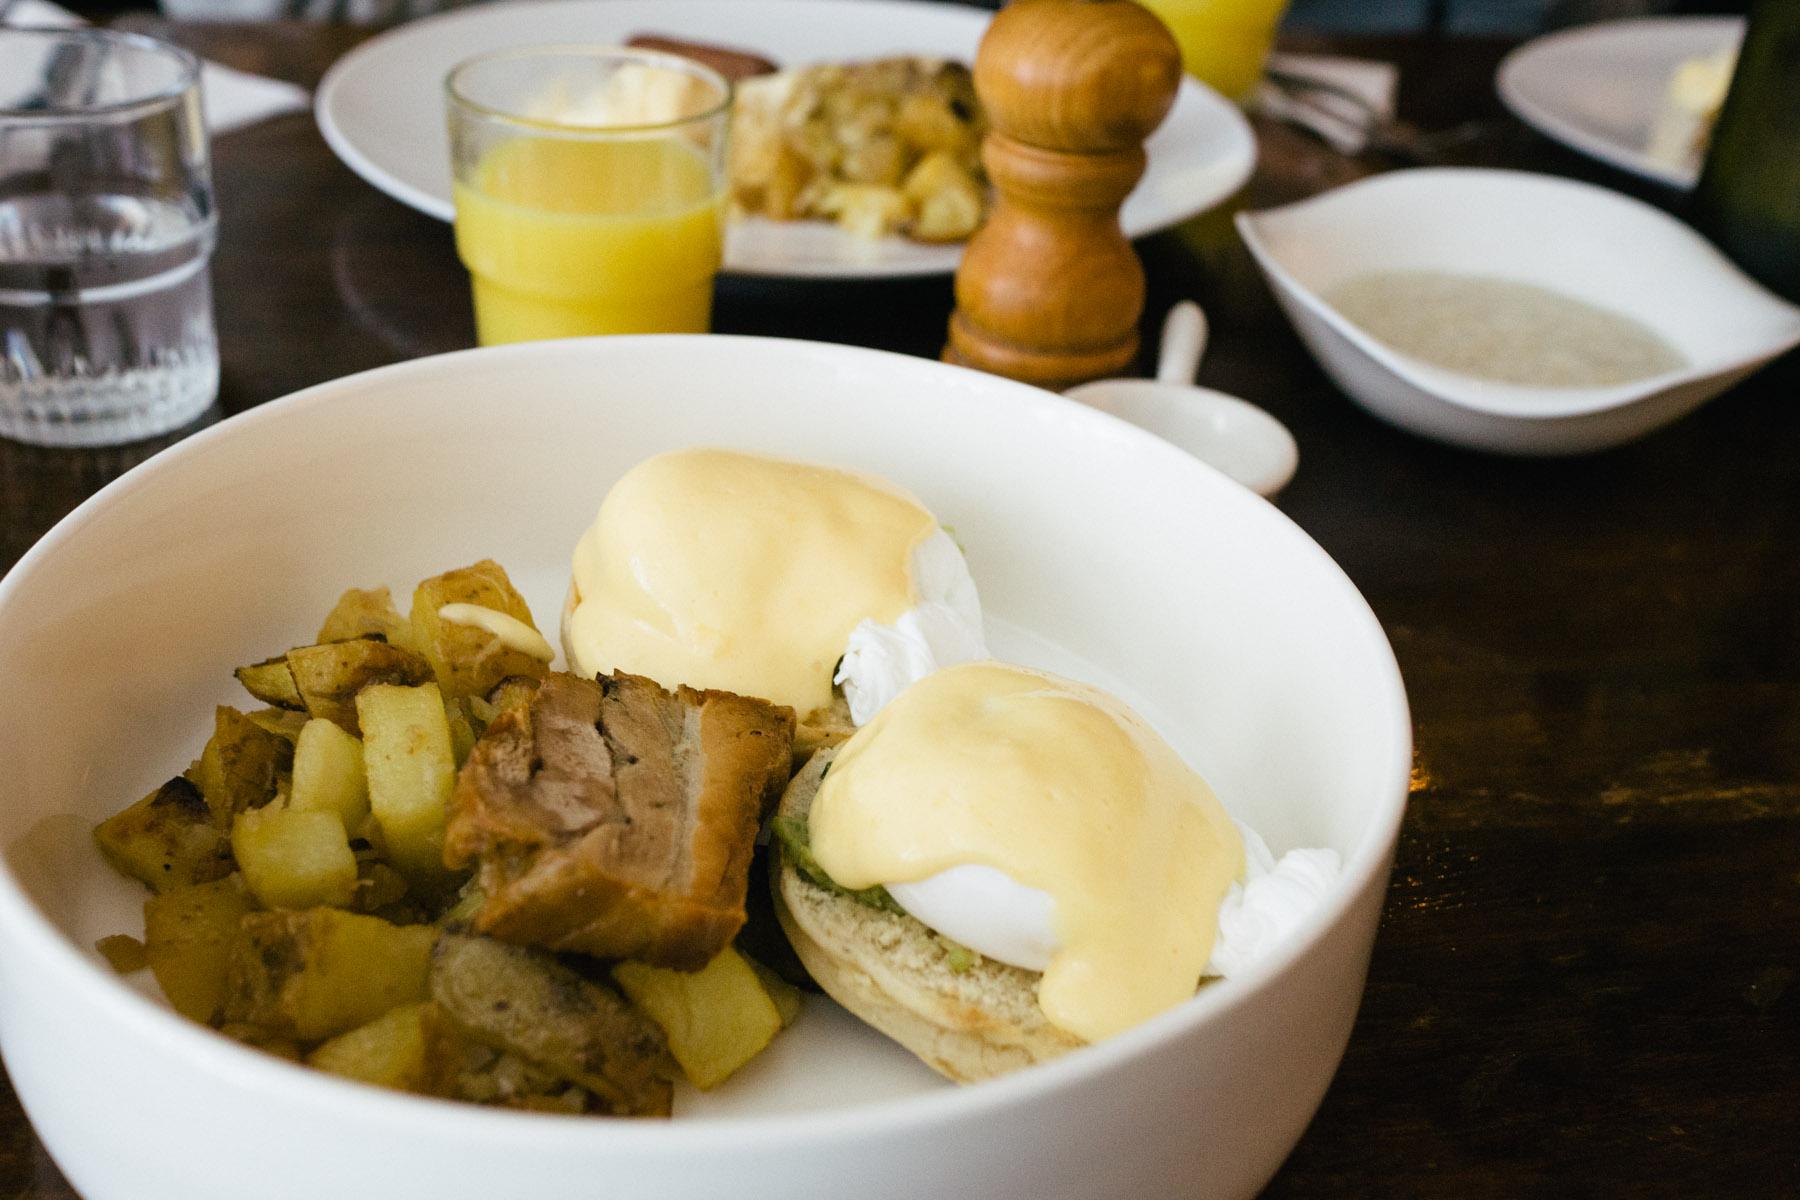 amsterdam-netherlands-jordaan-westerstraat-restaurante-fraiche-brunch-dinner-1